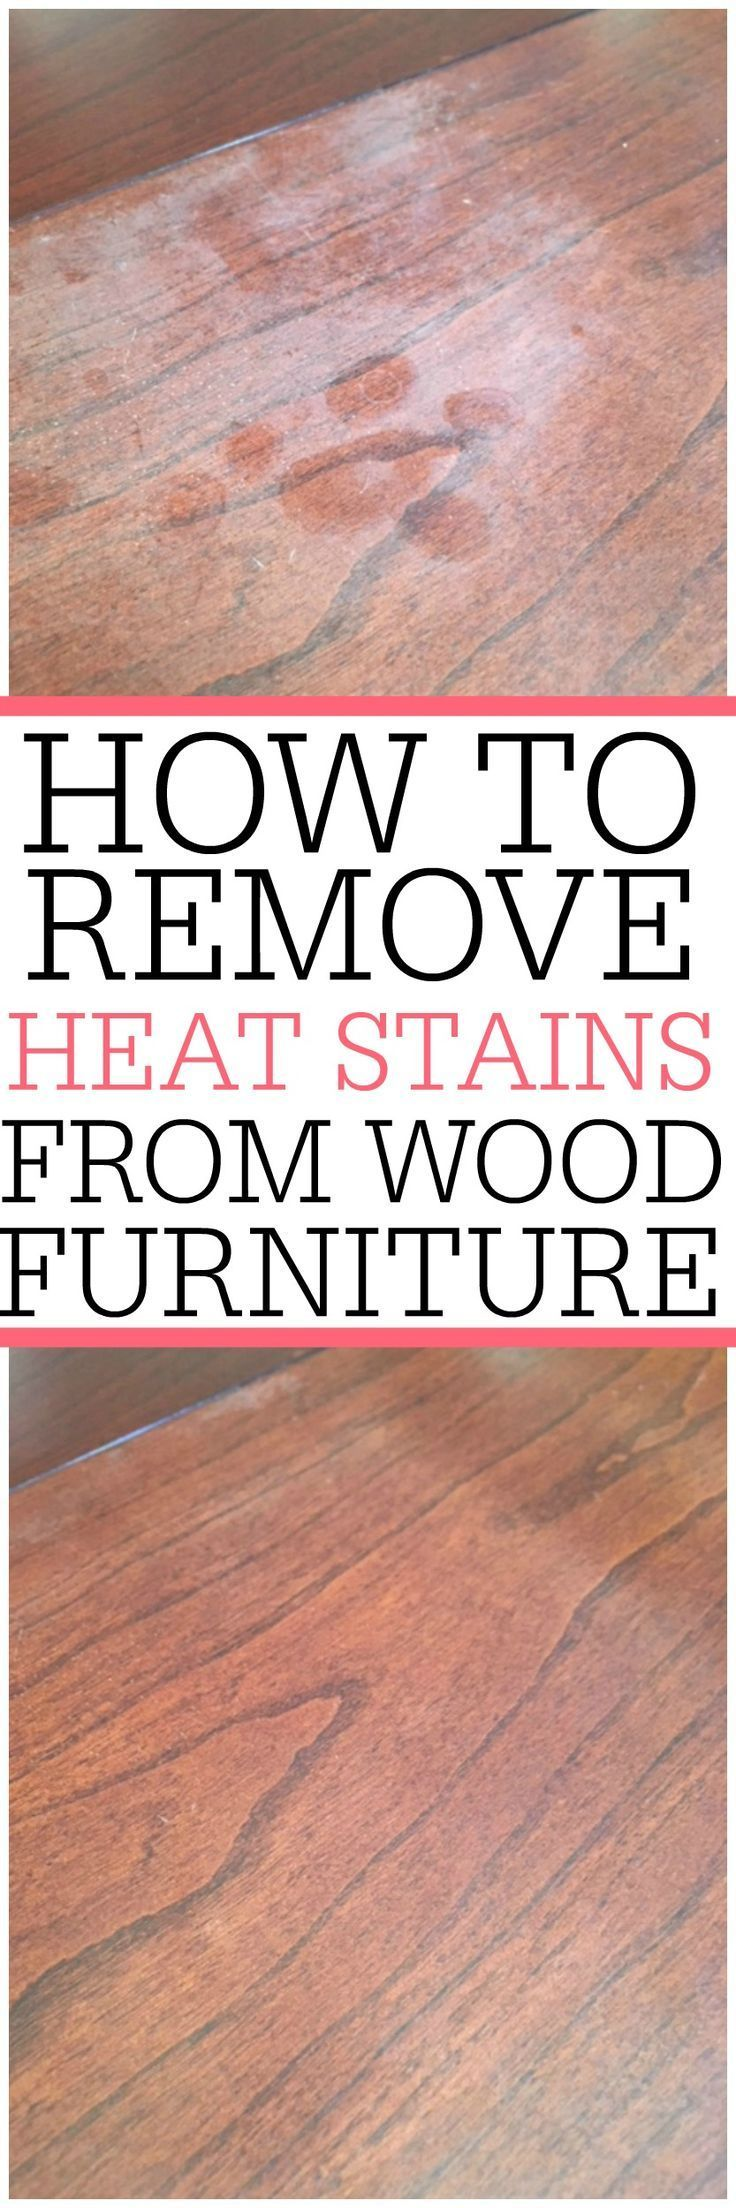 2489466dd1f304998ad6f6a163391191 - How To Get Rid Of Wet Stains On Wood